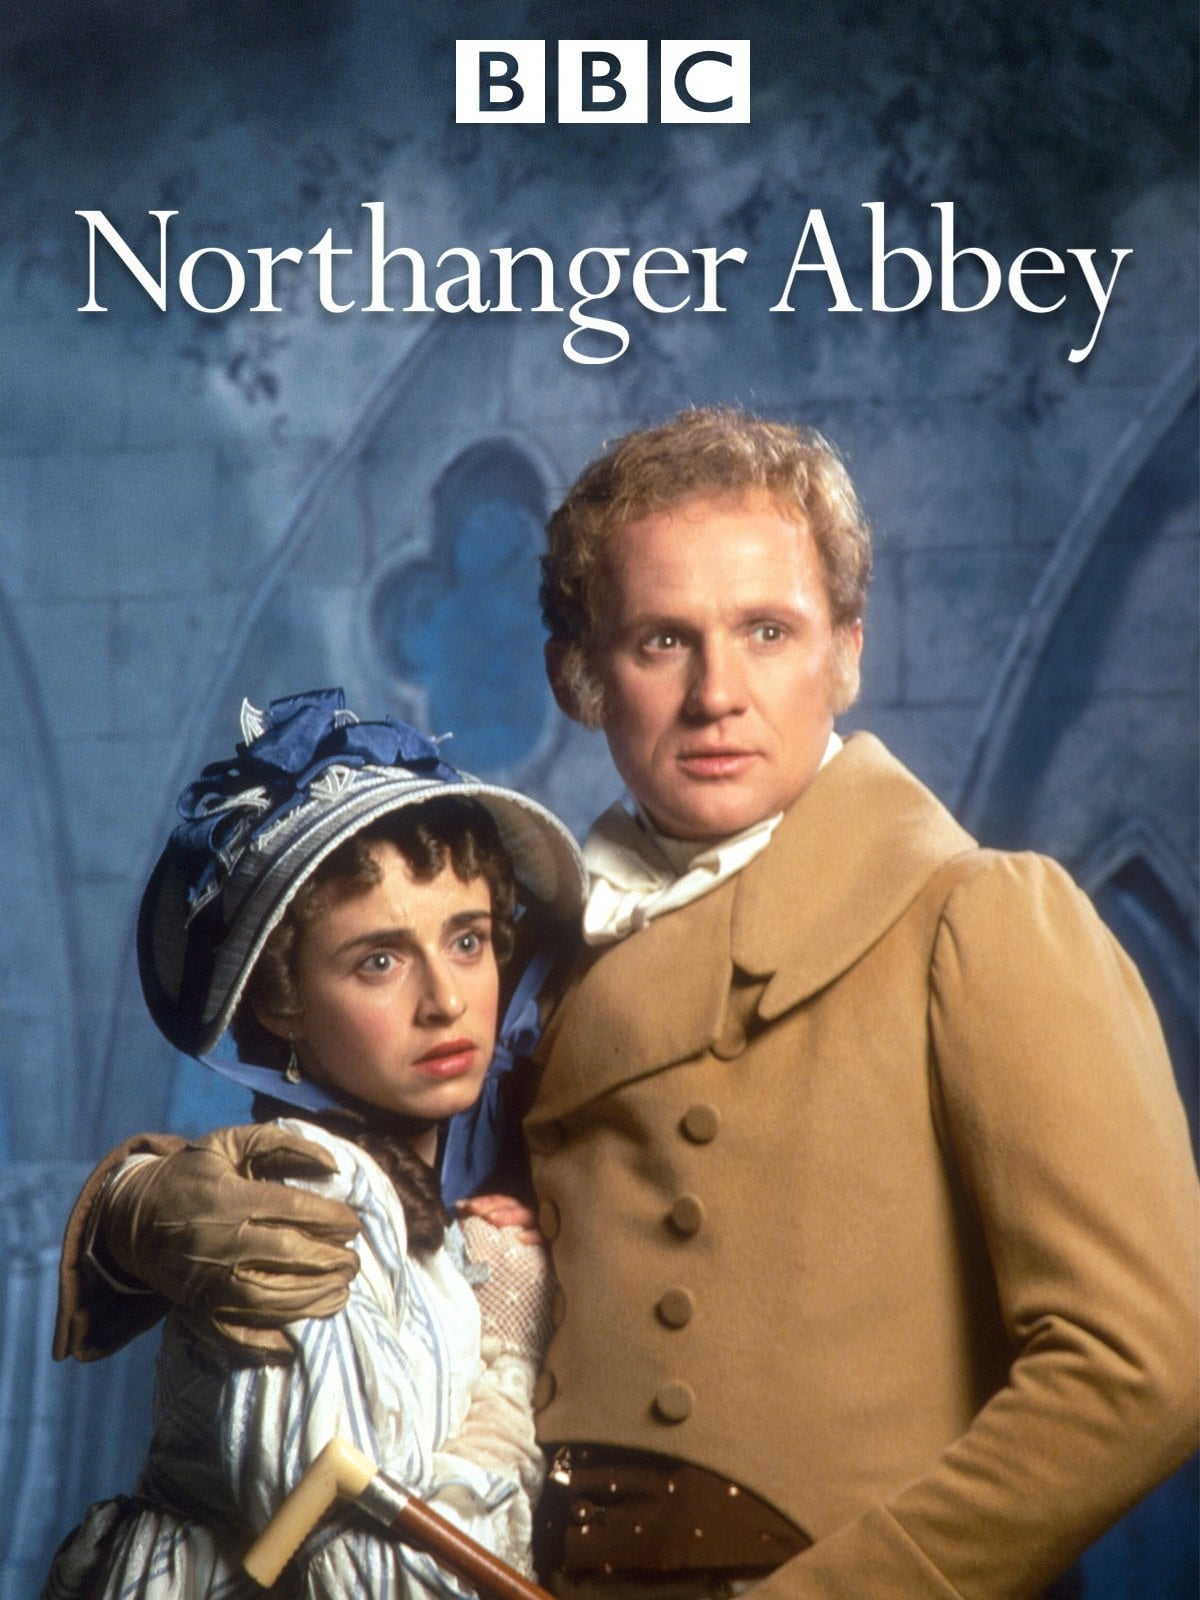 Northanger Abbey (1986)